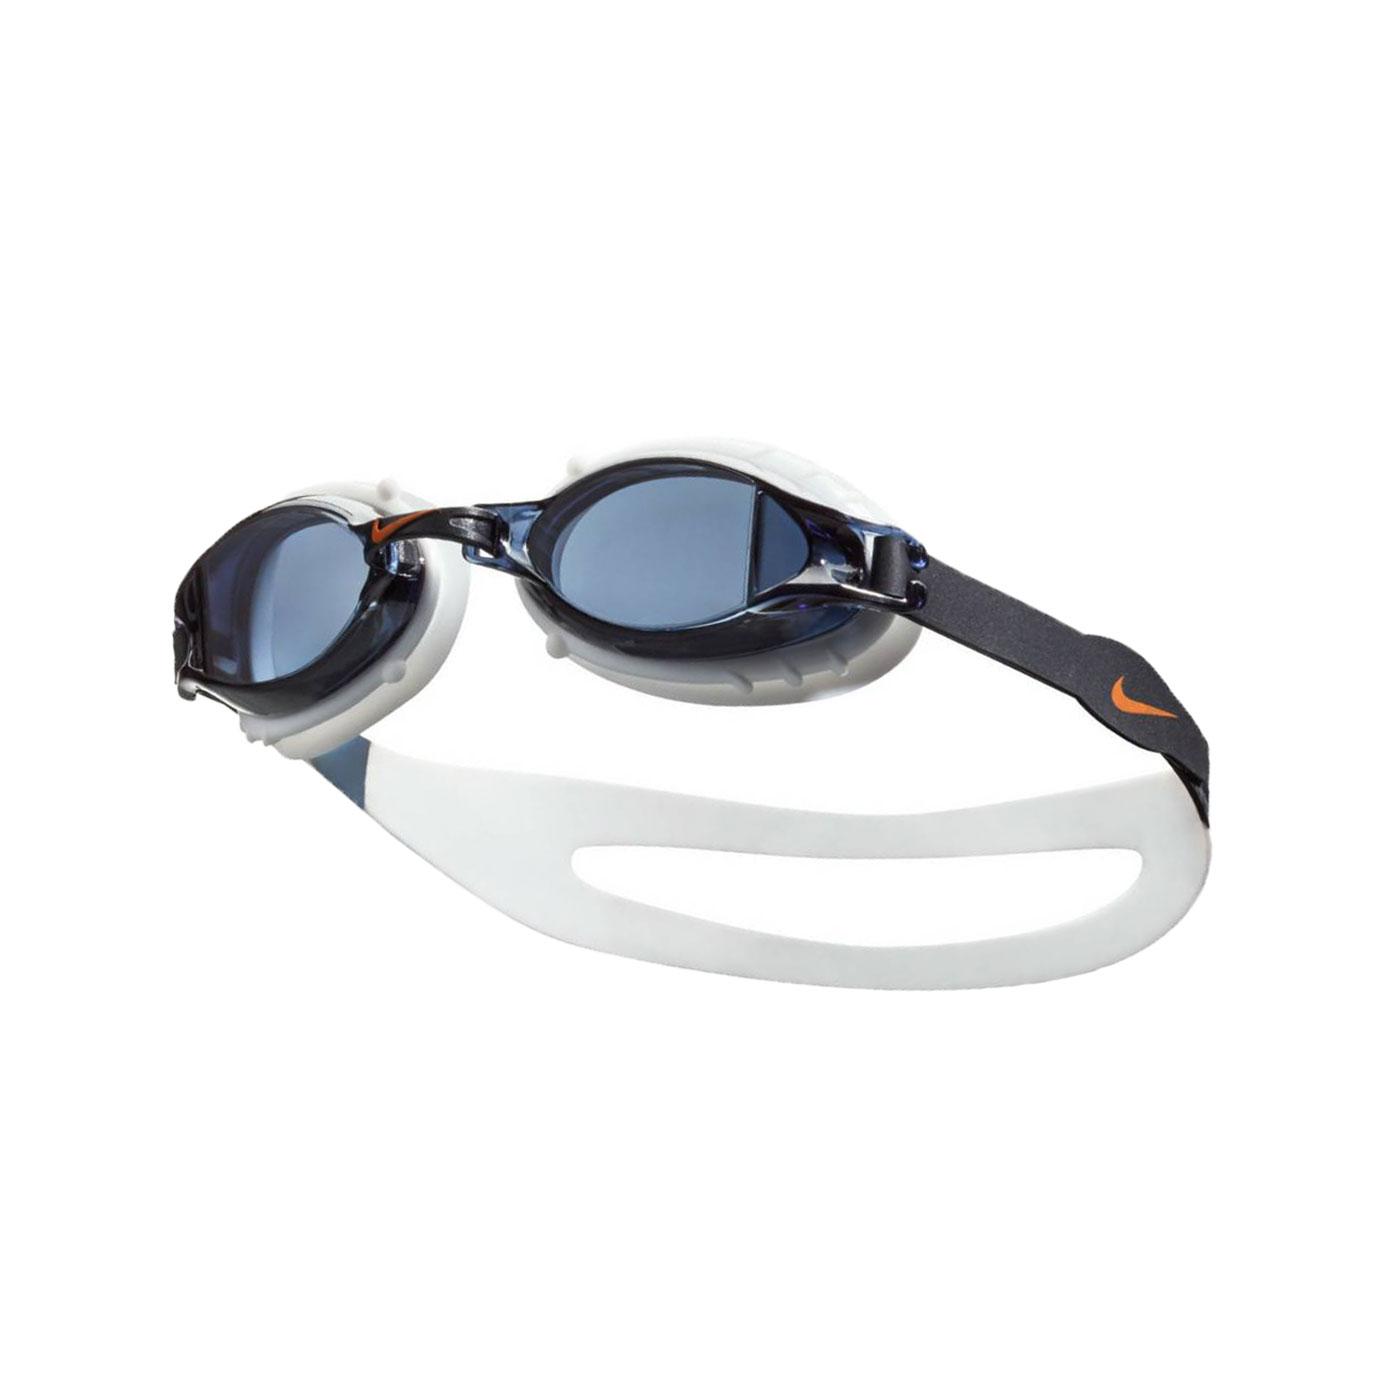 NIKE SWIM 訓練型兒童泳鏡 NESSA188-014 - 白黑橘